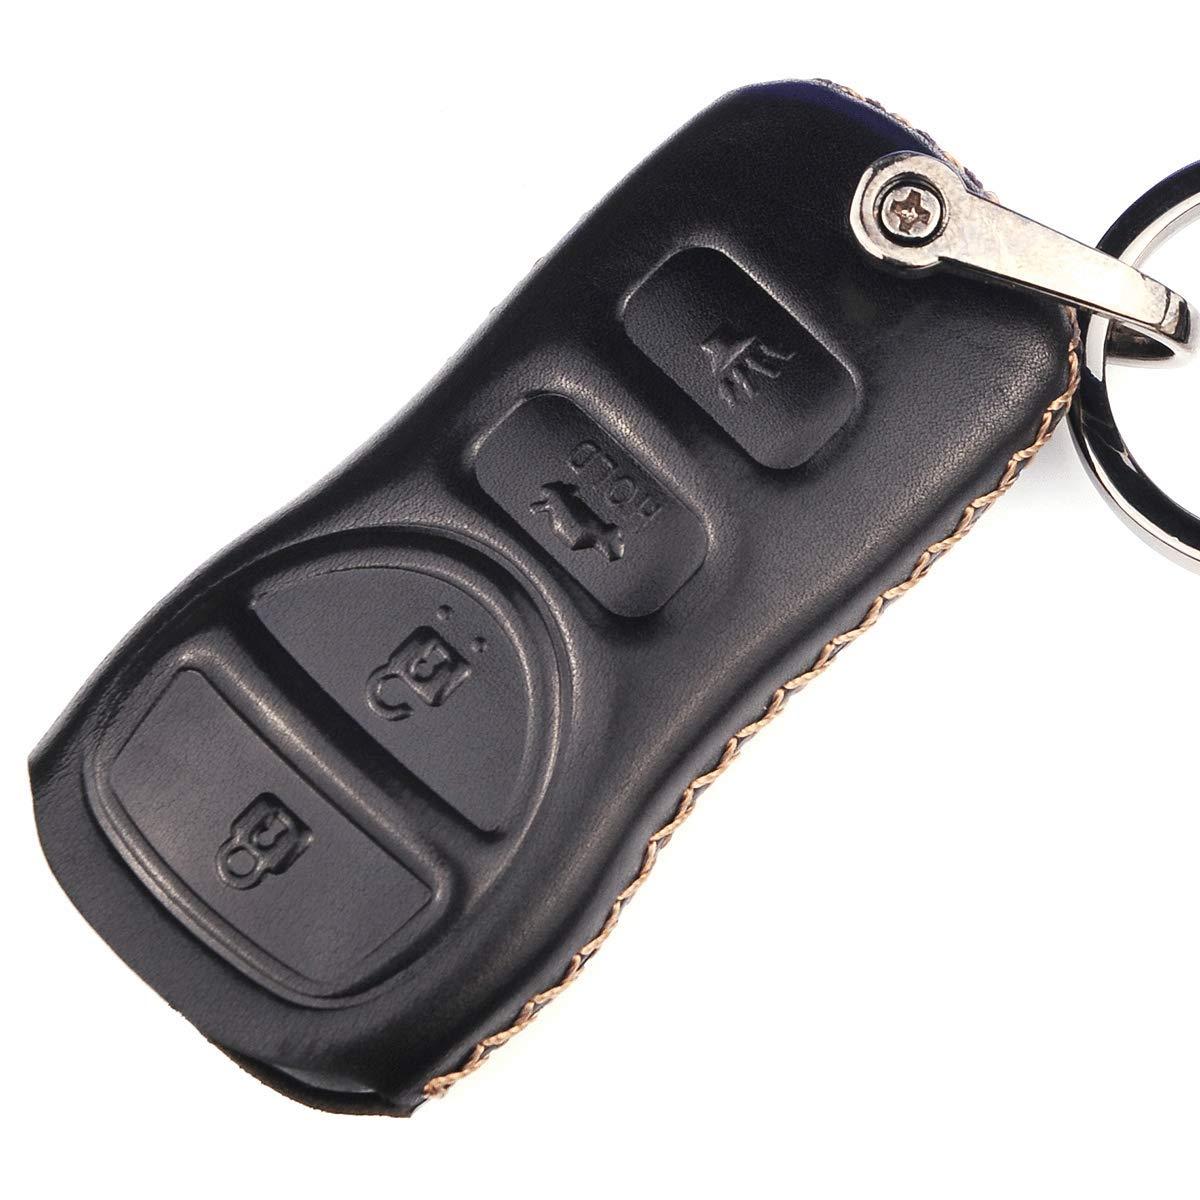 Cadtealir absortive Baby Calfskin Infiniti fx35 fx45 g35 i35 qx56 qx4 Nissan 350z Armada Altima Frontier Maxima Murano NV nv200 Pathfinder Quest Sentra Titan Versa Xterra Key Fob Cover case Holder